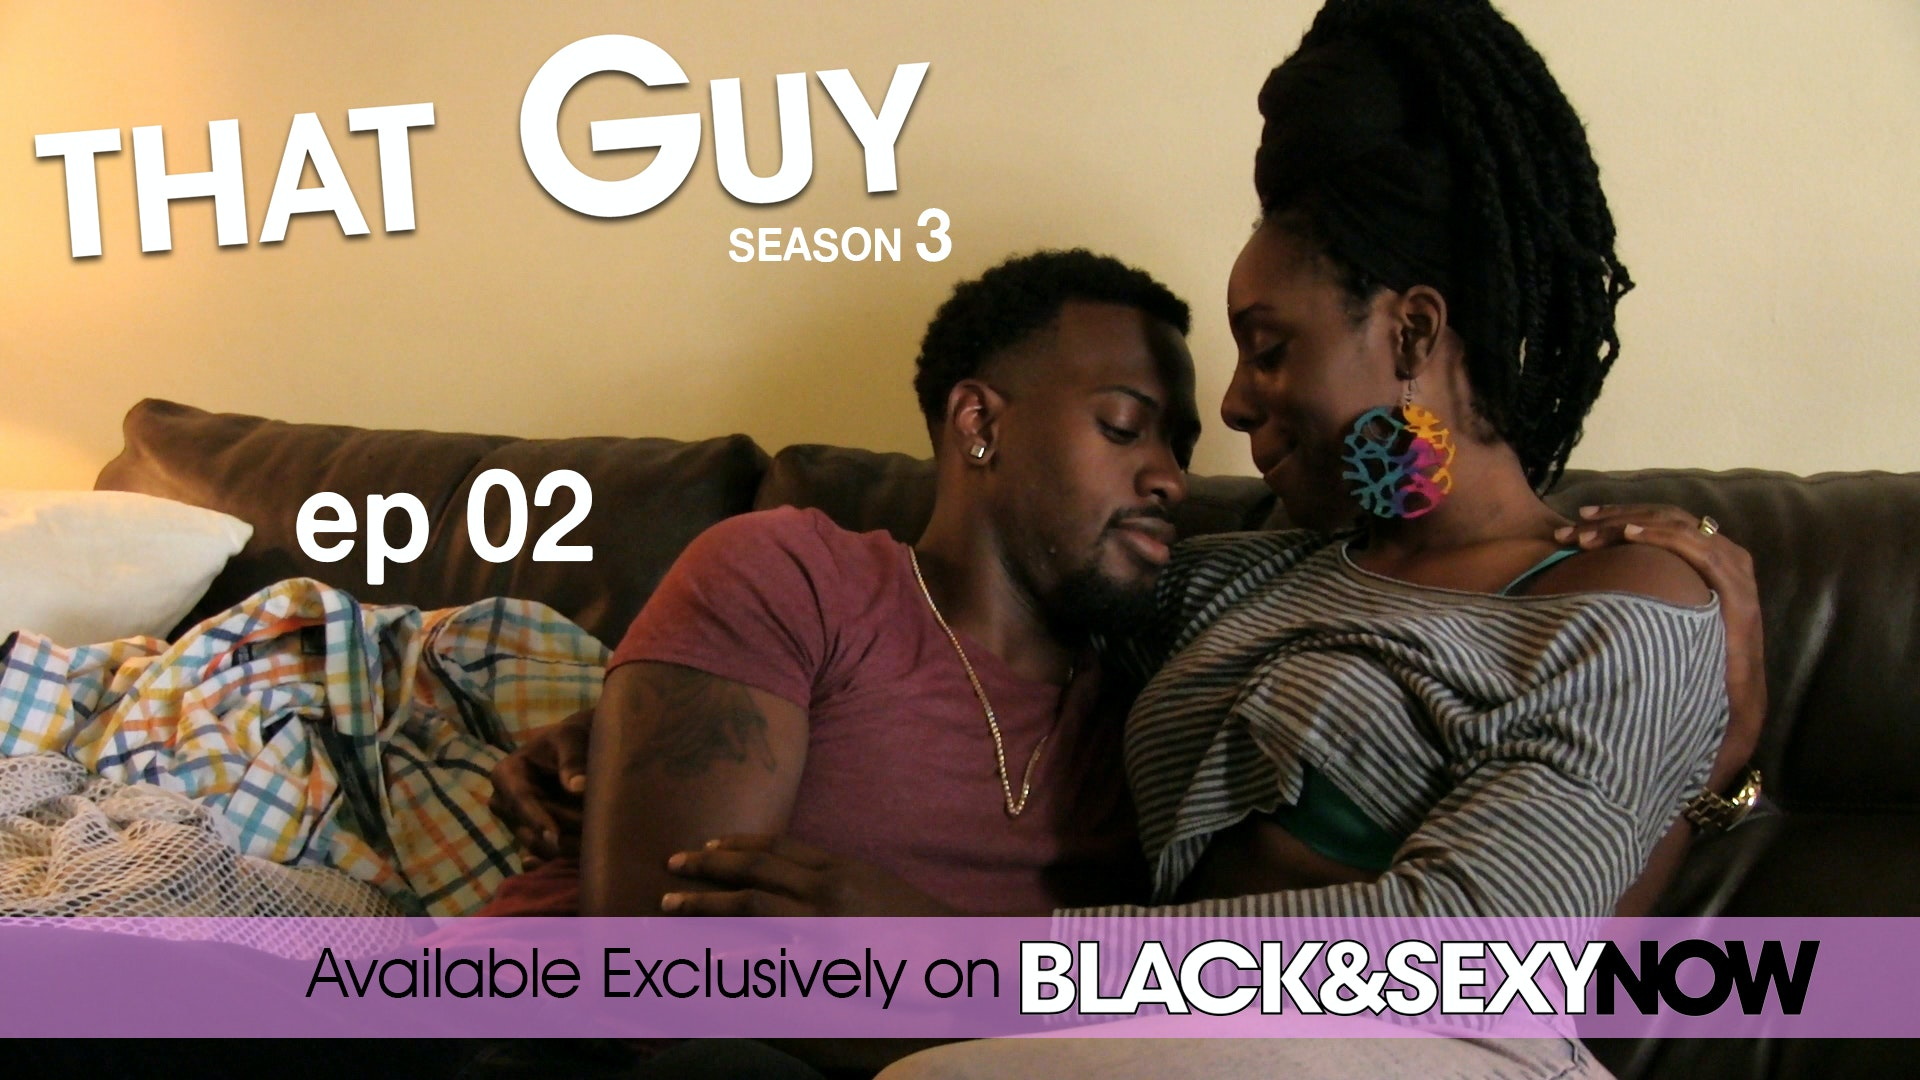 That guy blackandsexytv season 3